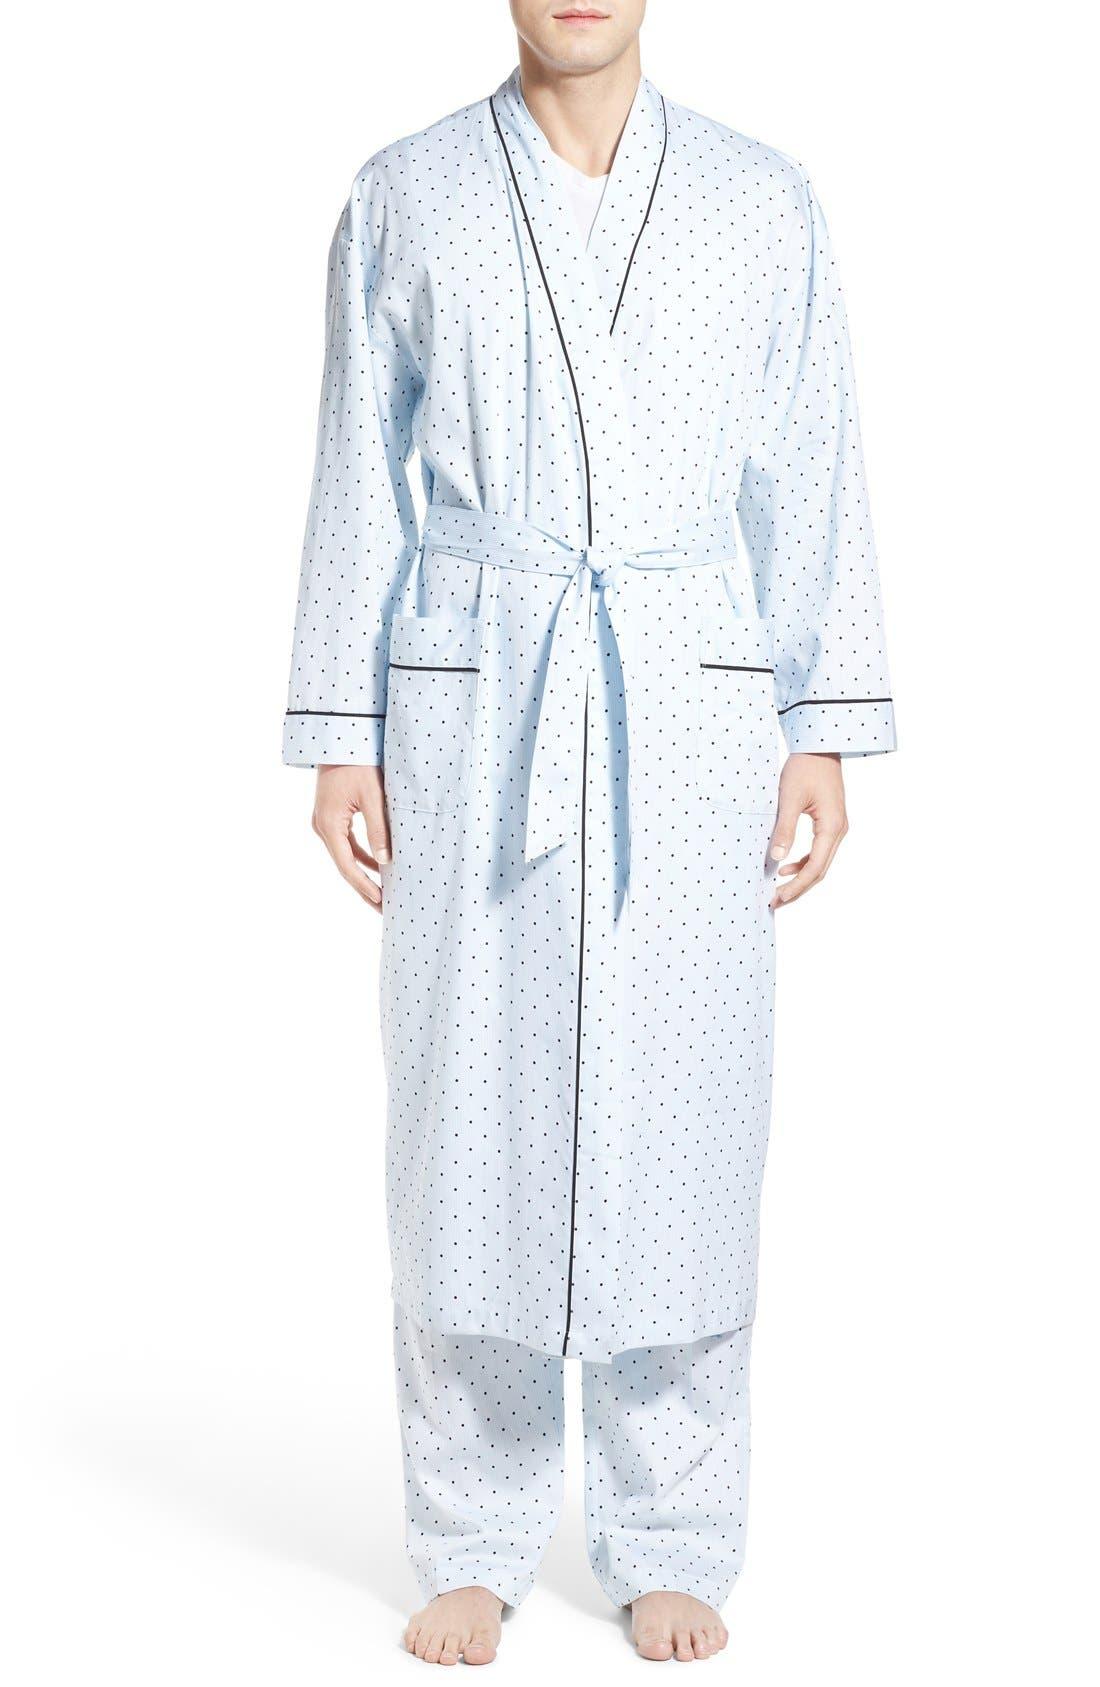 Alternate Image 1 Selected - Majestic International 'Twilight Blue' Cotton Robe